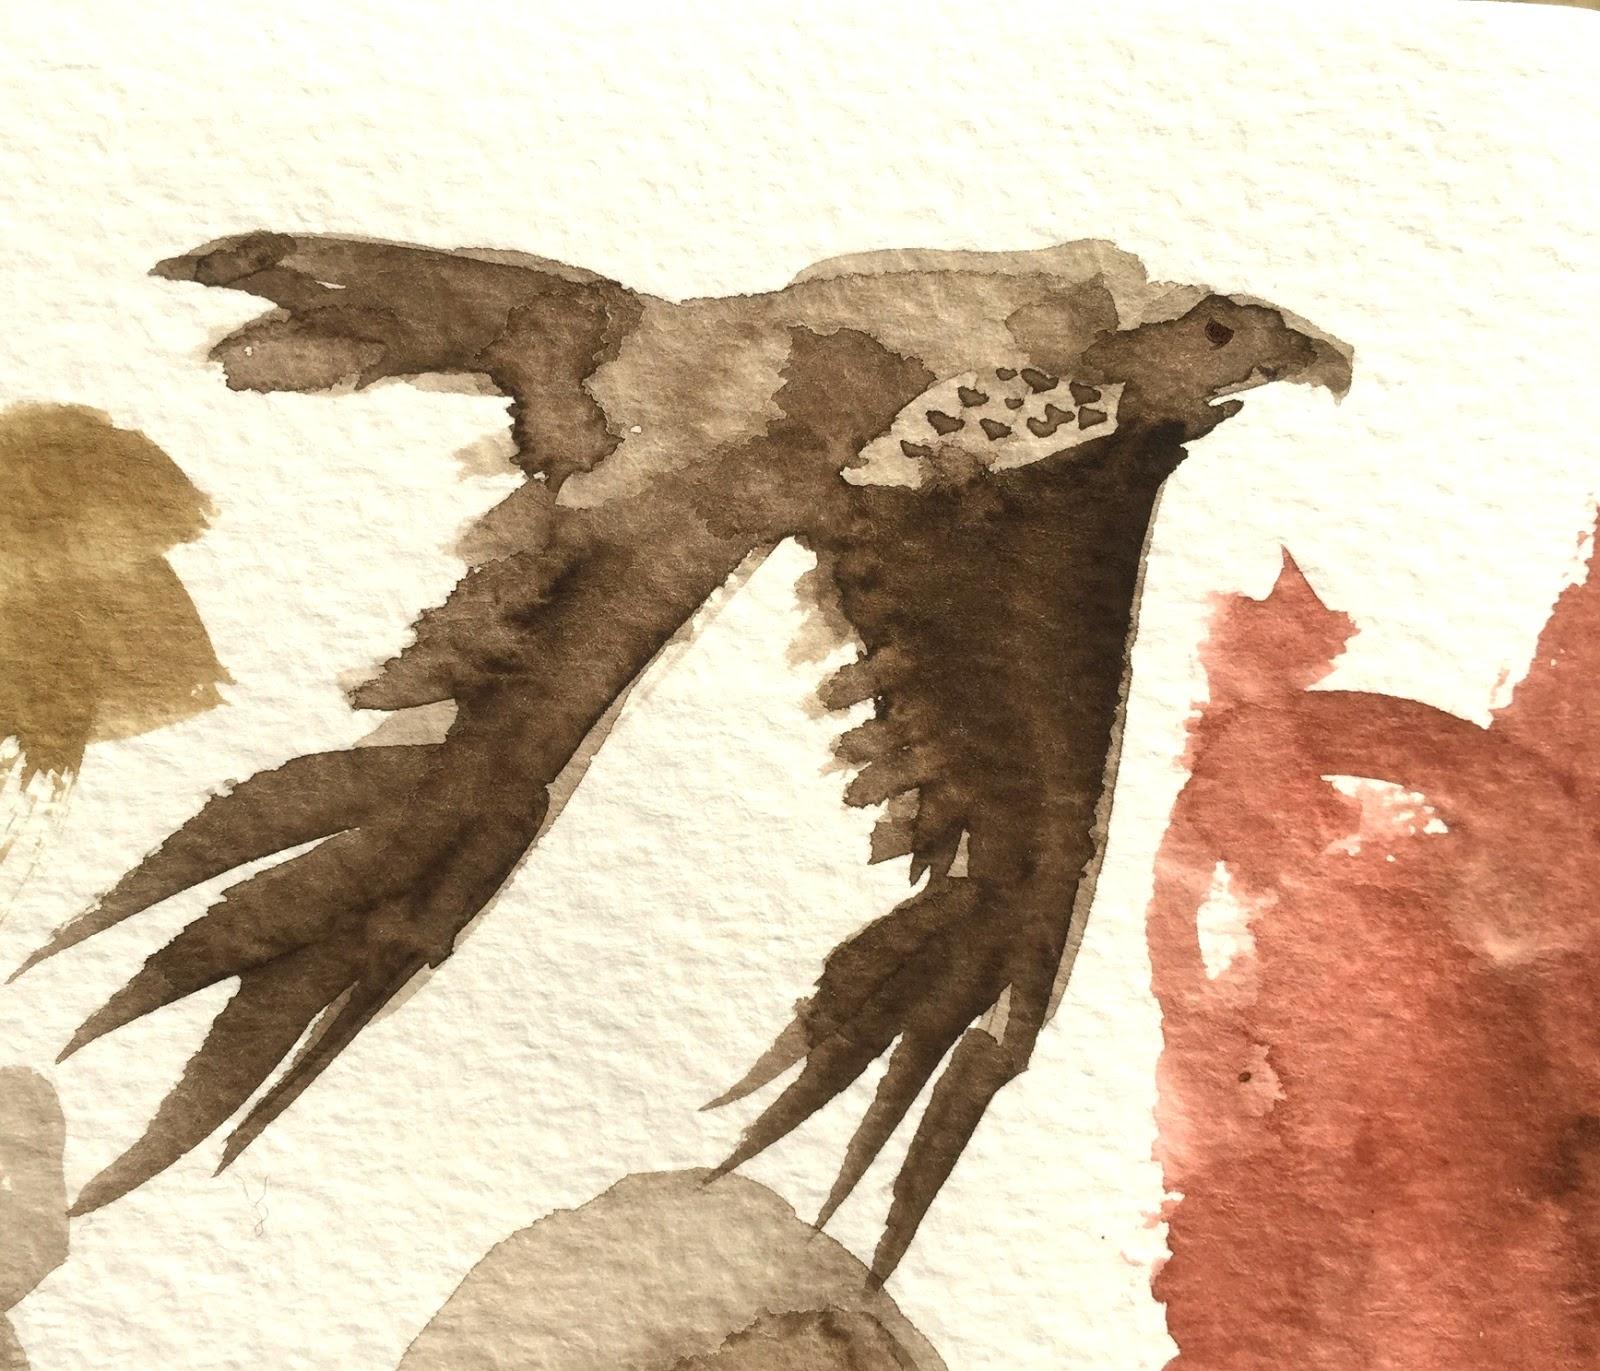 Watercolor Study - doodle by Artmagenta